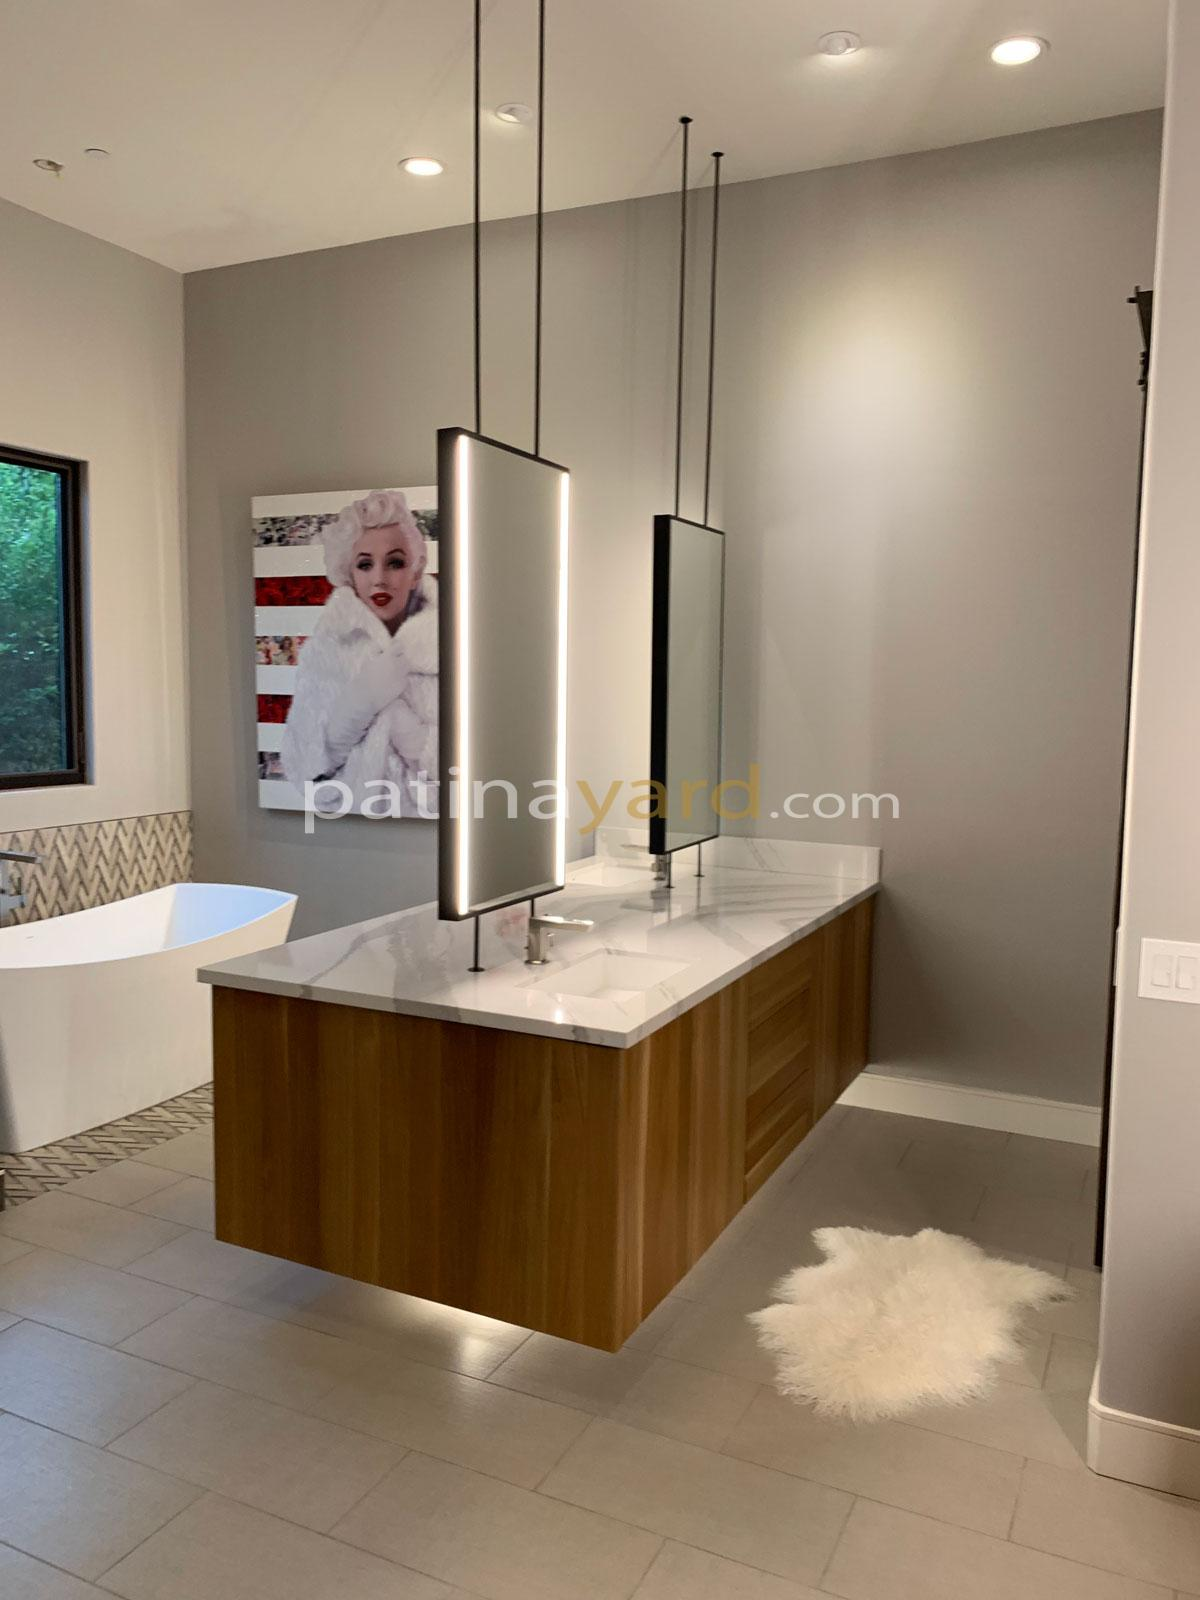 custom vanity and white oak contemporary cabinet